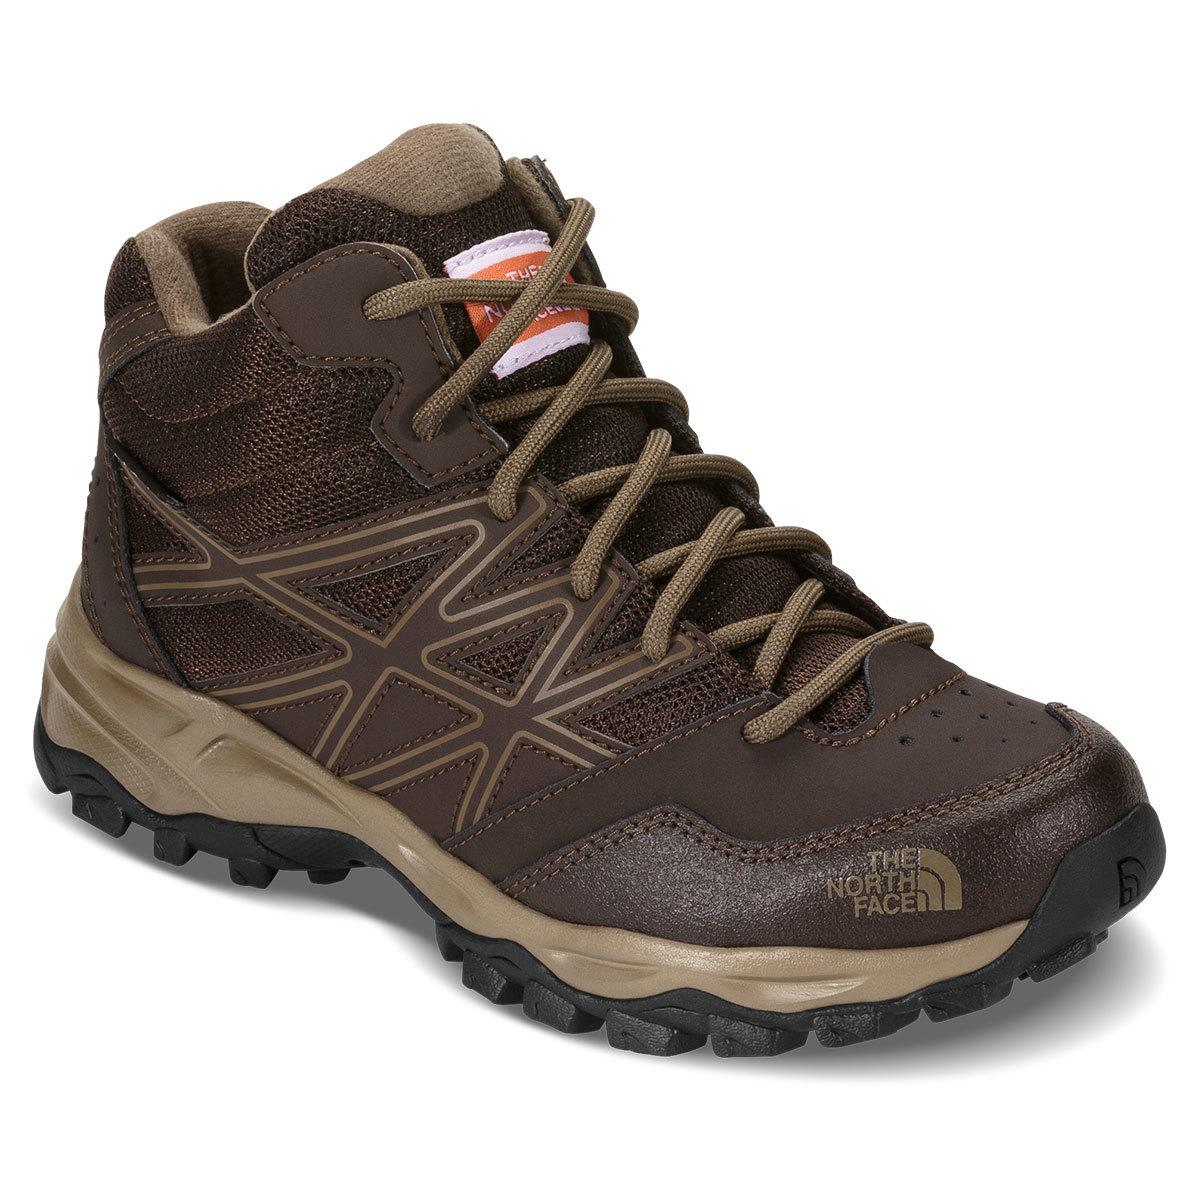 The North Face Boys' Jr Hedgehog Hiker Mid Waterproof Hiking Boots - Brown, 3